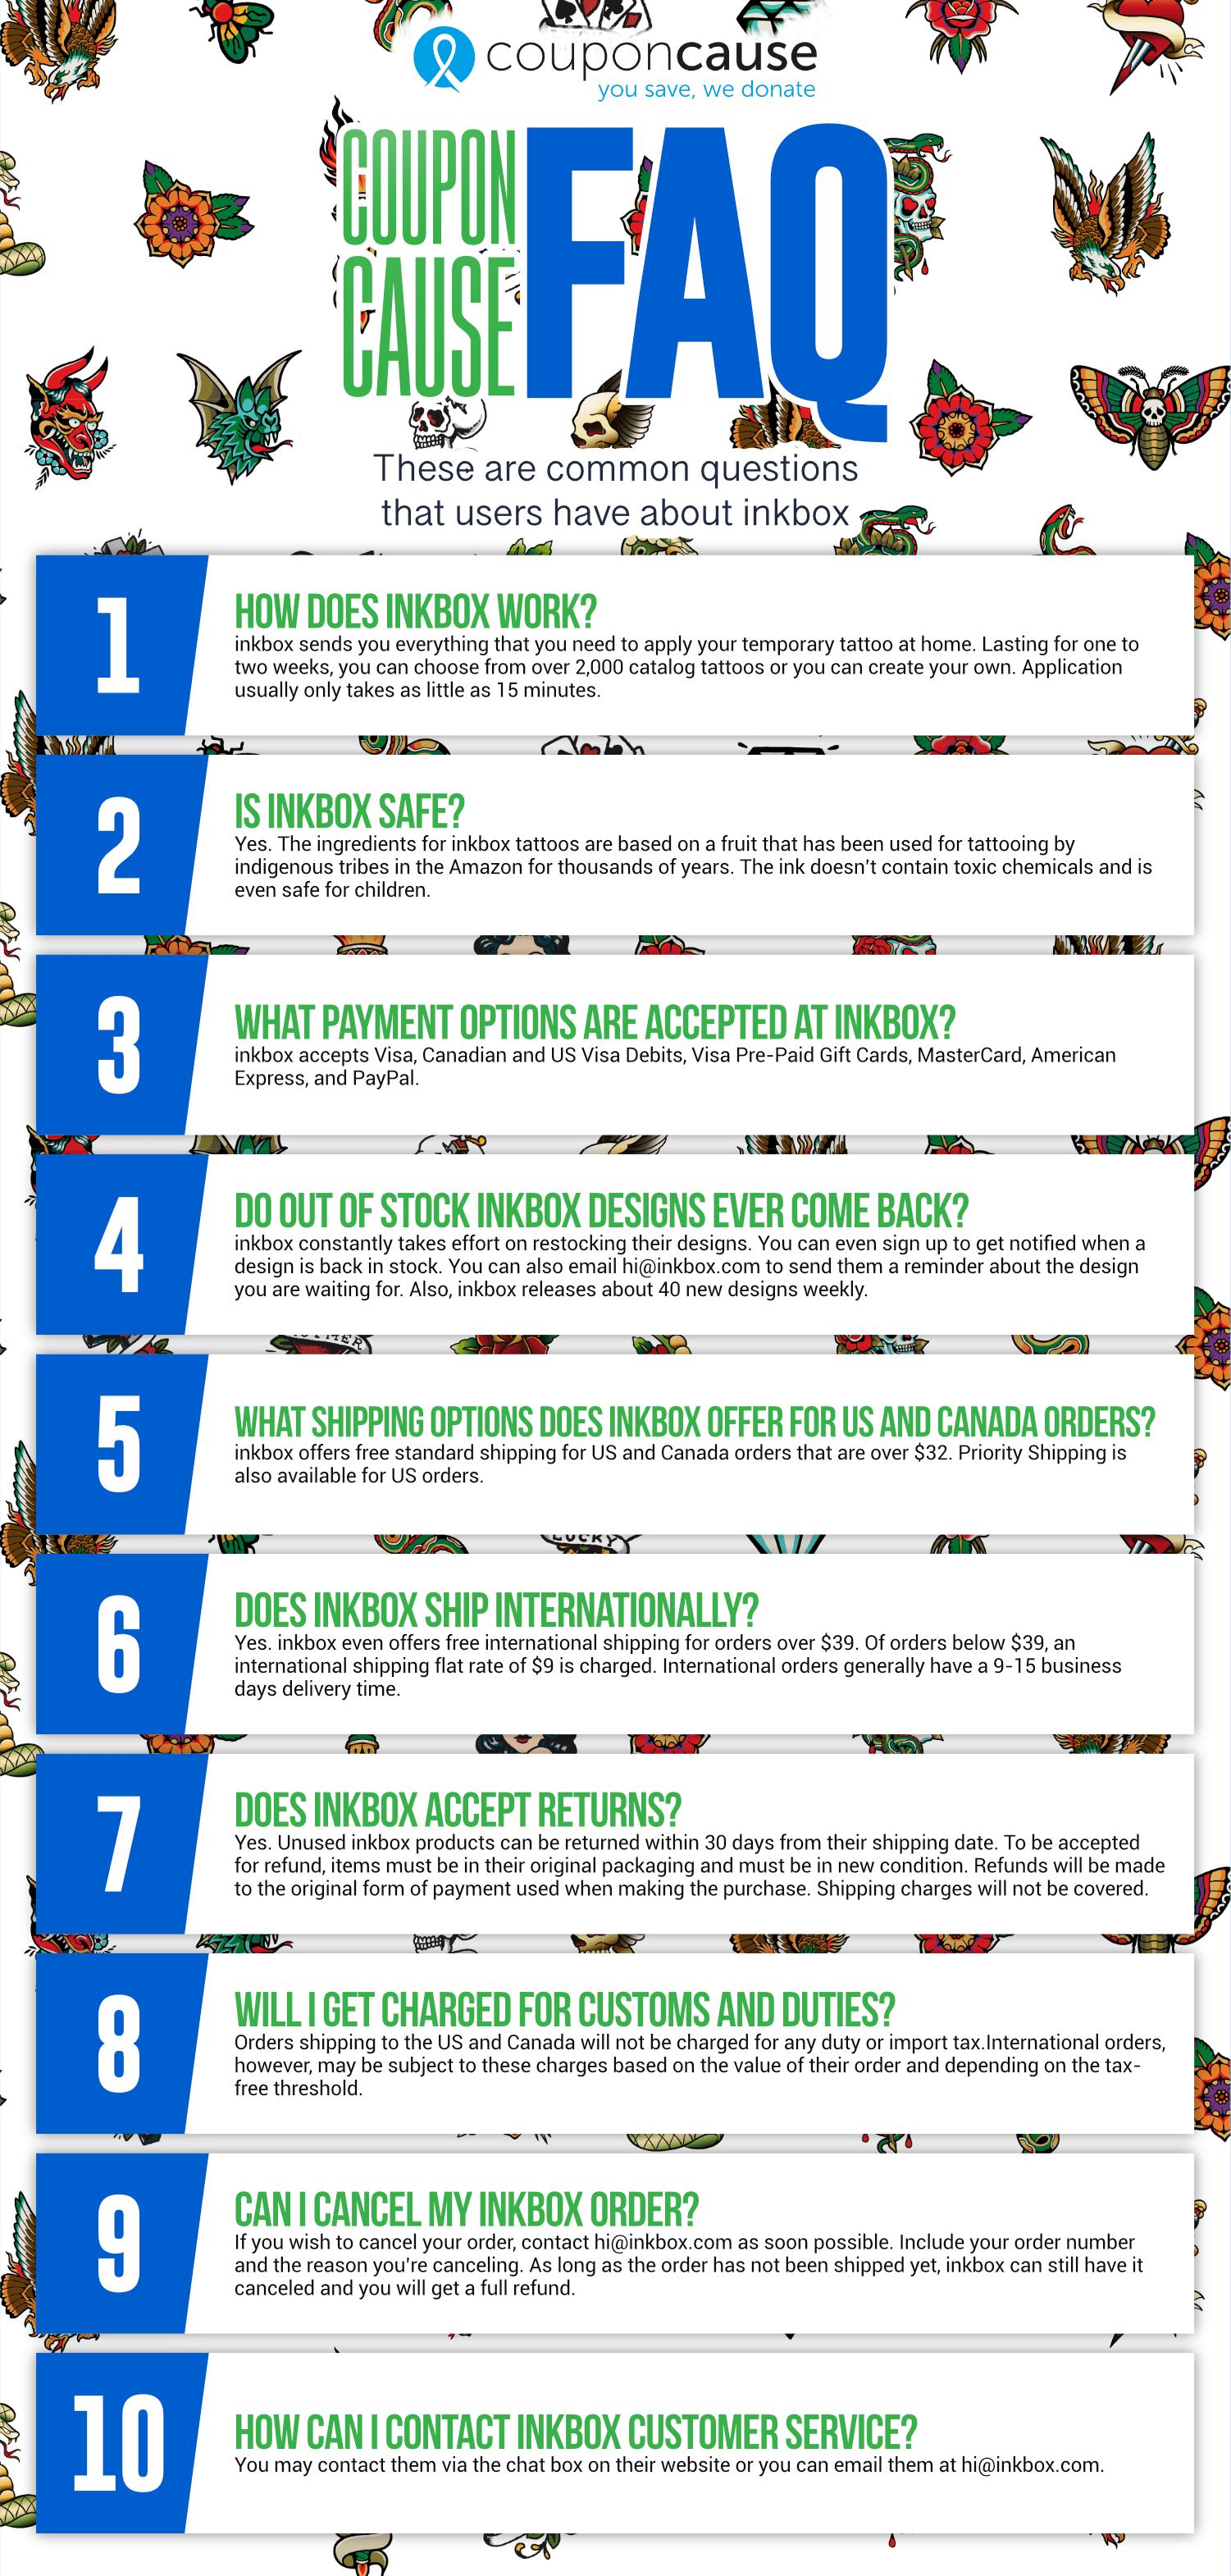 inkbox Infographic Order Coupon Cause FAQ (C.C. FAQ)